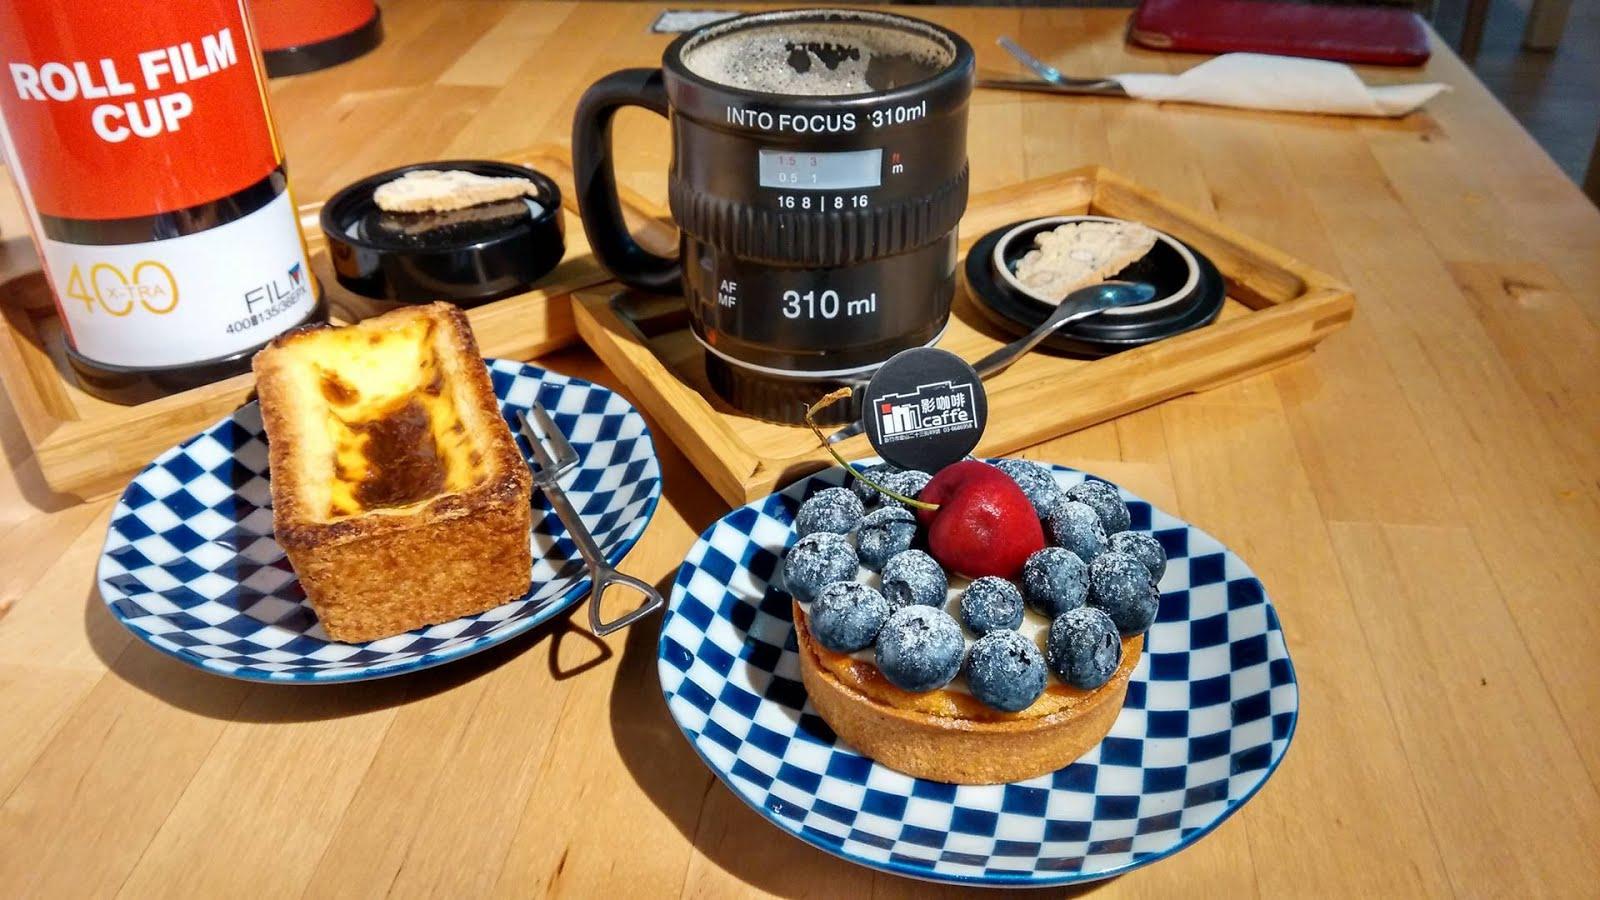 Wei Ta 's Life / 薇妲 日記: 影咖啡 Inn Caffè (新竹市 金山街 下午茶 咖啡廳 攝影 甜點 咖啡 攝影)